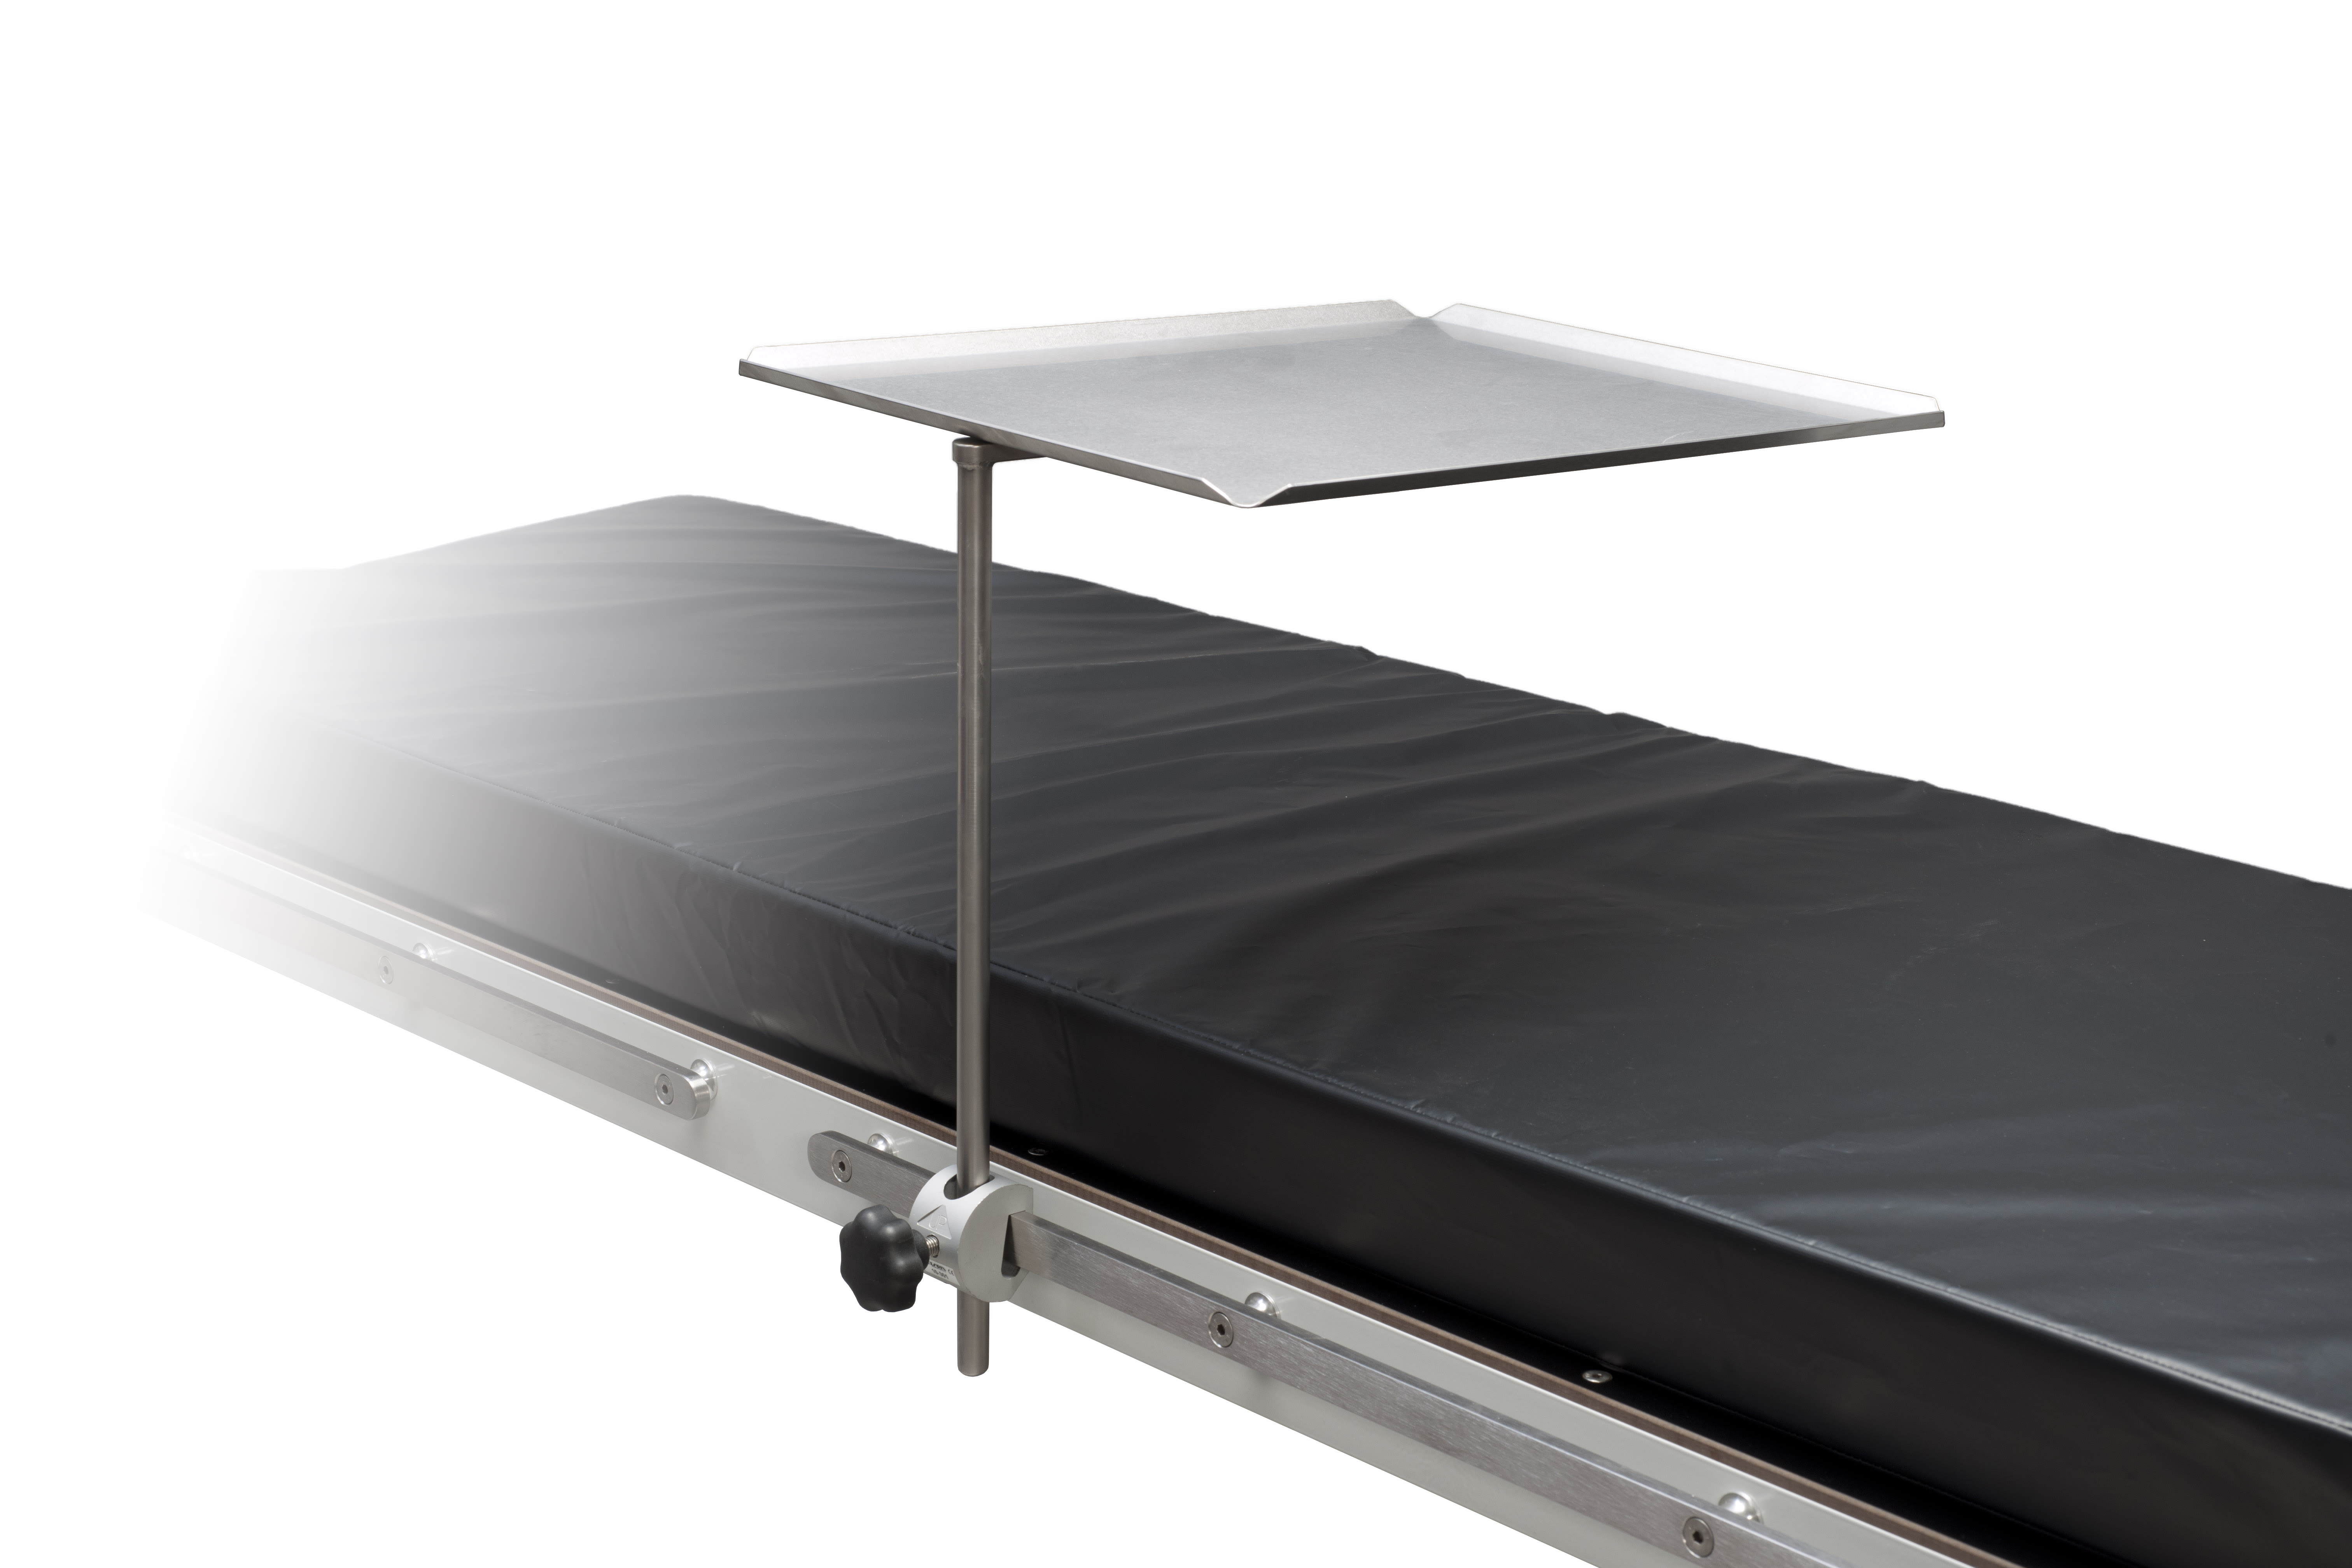 Instrument Table (10-060) - L500 x W400 with L470mm Stem